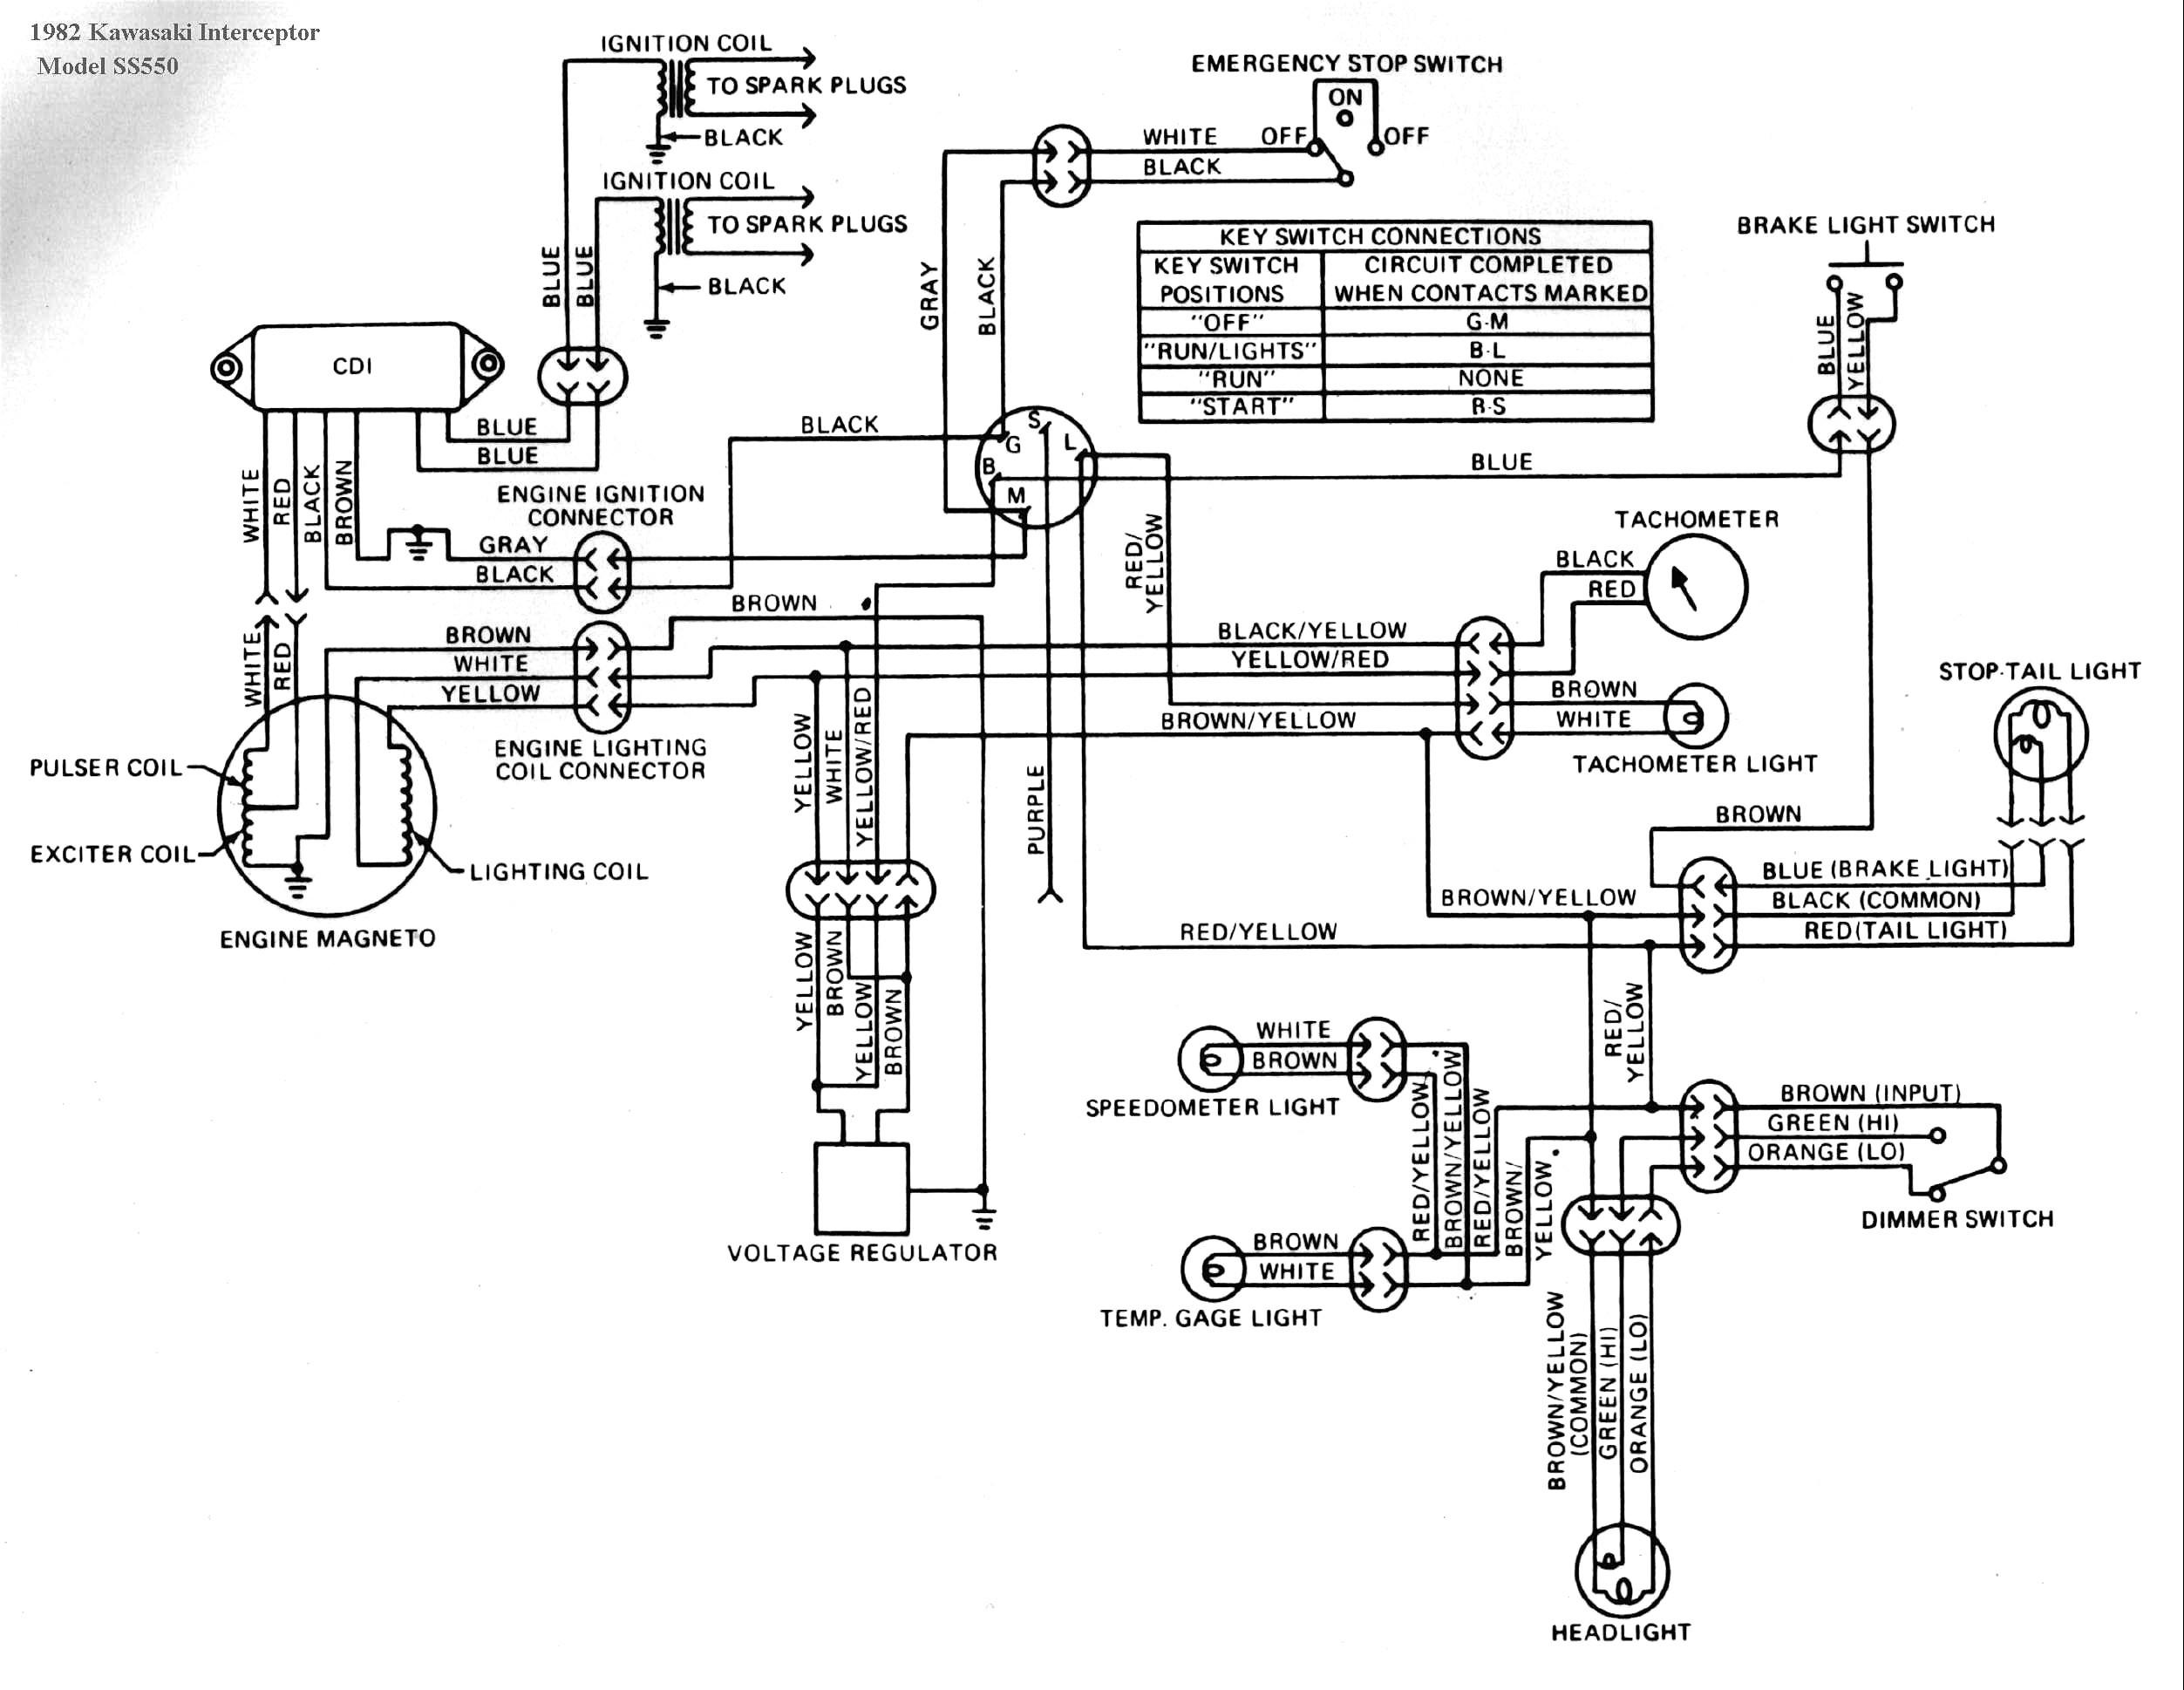 kfx400 wiring diagram wiring diagram update